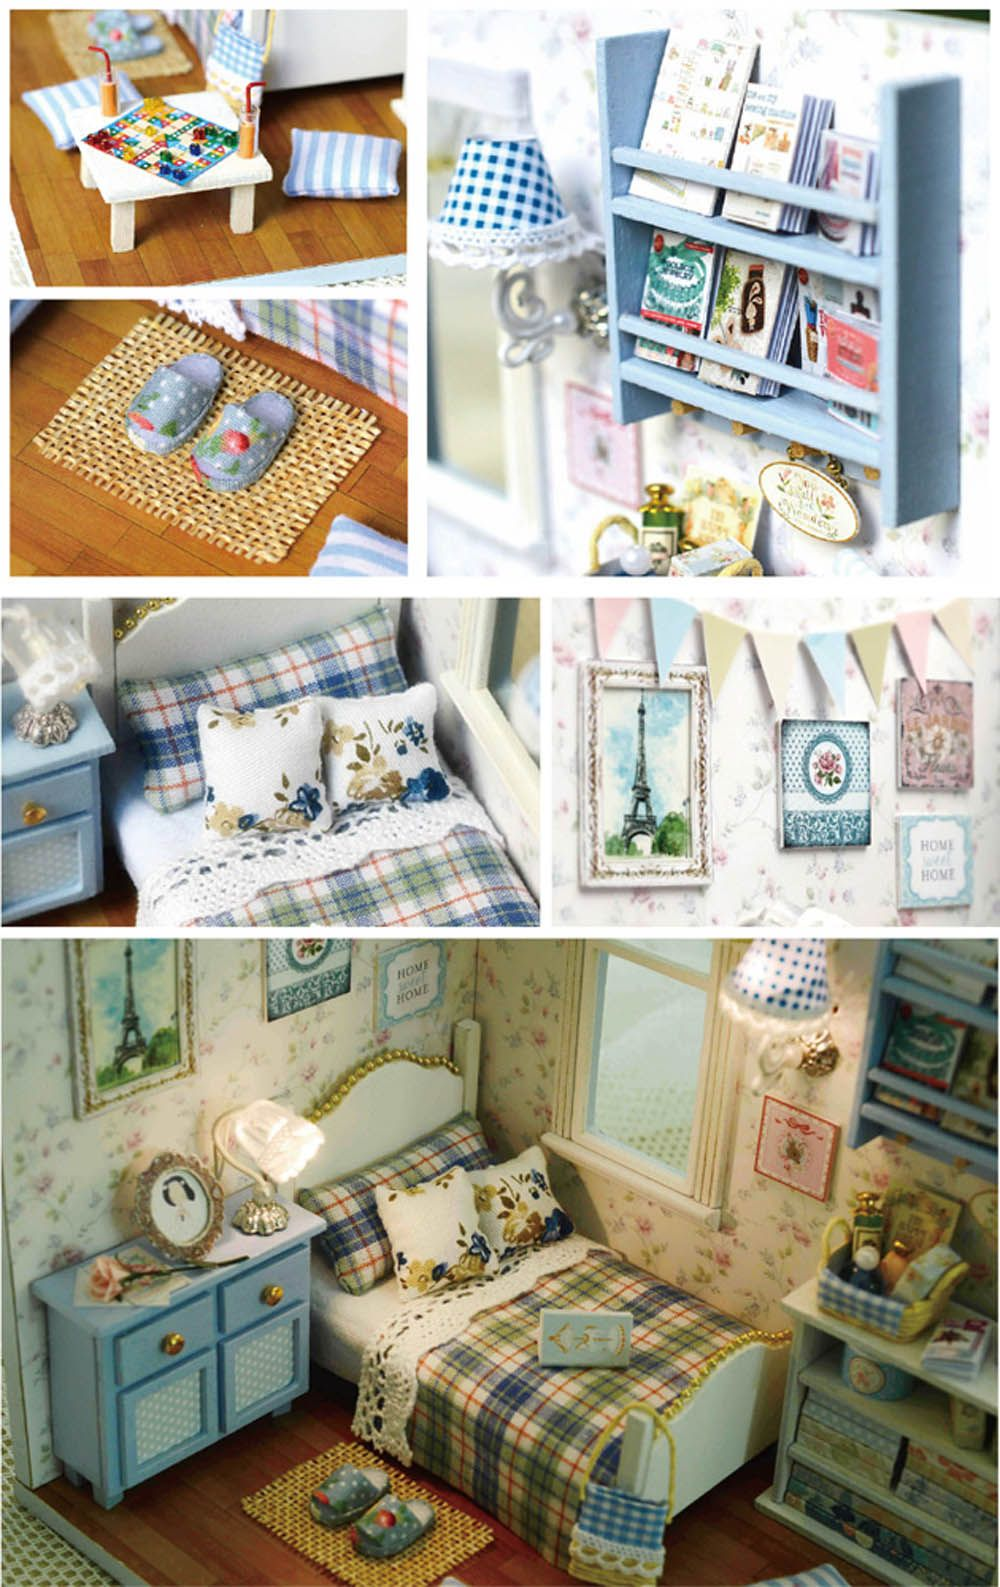 CUTEROOM H - 003 DIY Wooden House Furniture Handcraft Miniature Box Kit